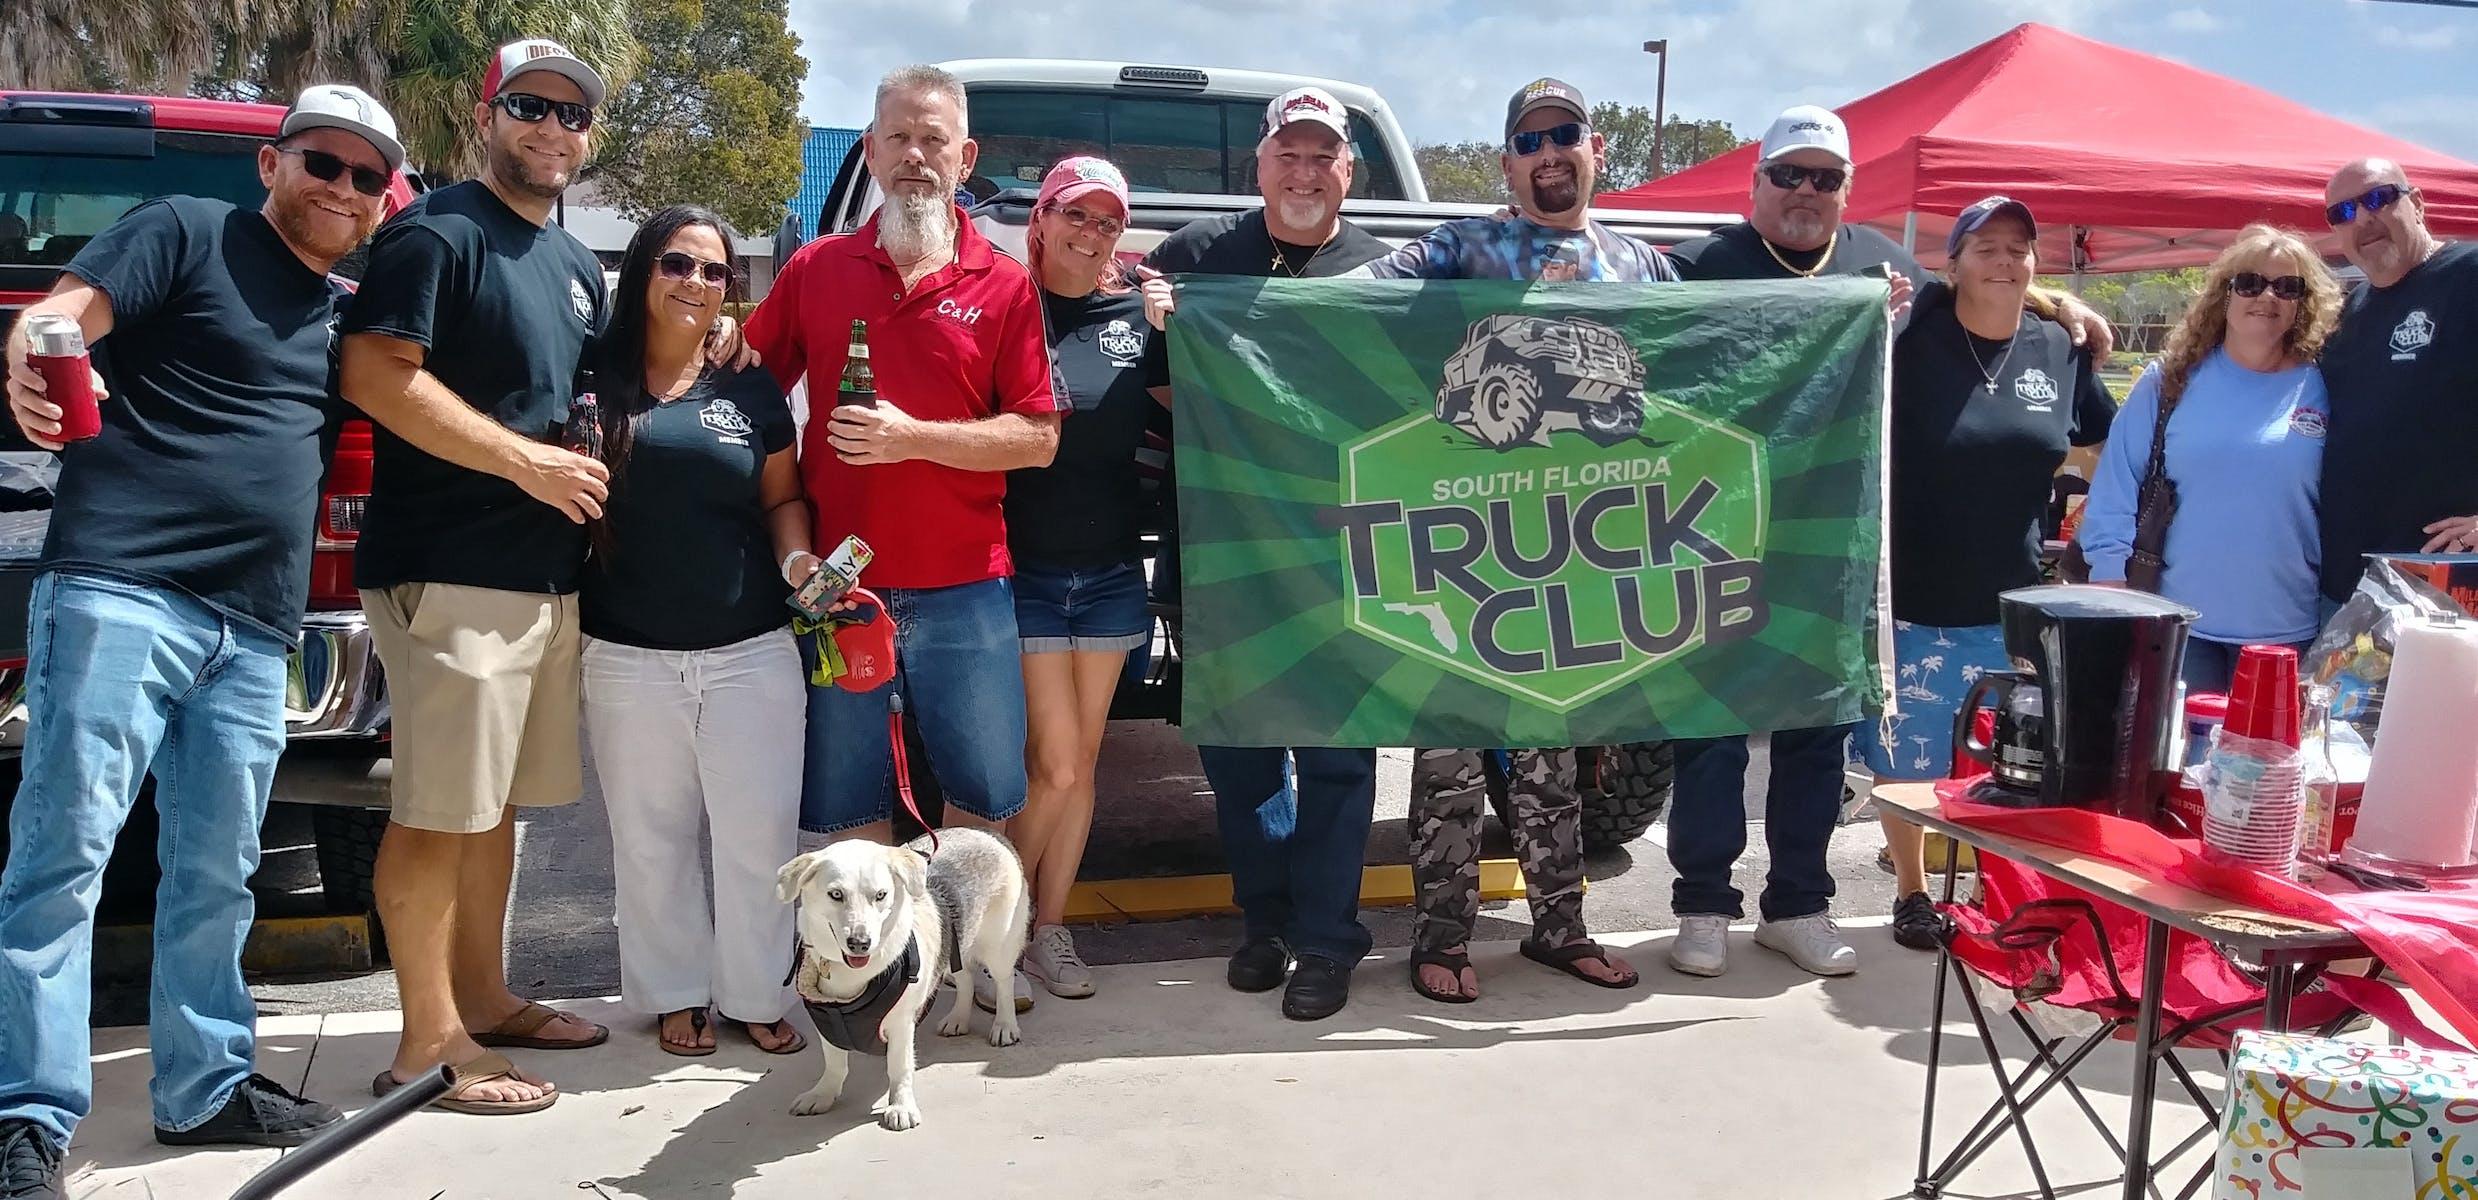 South Florida Truck Club